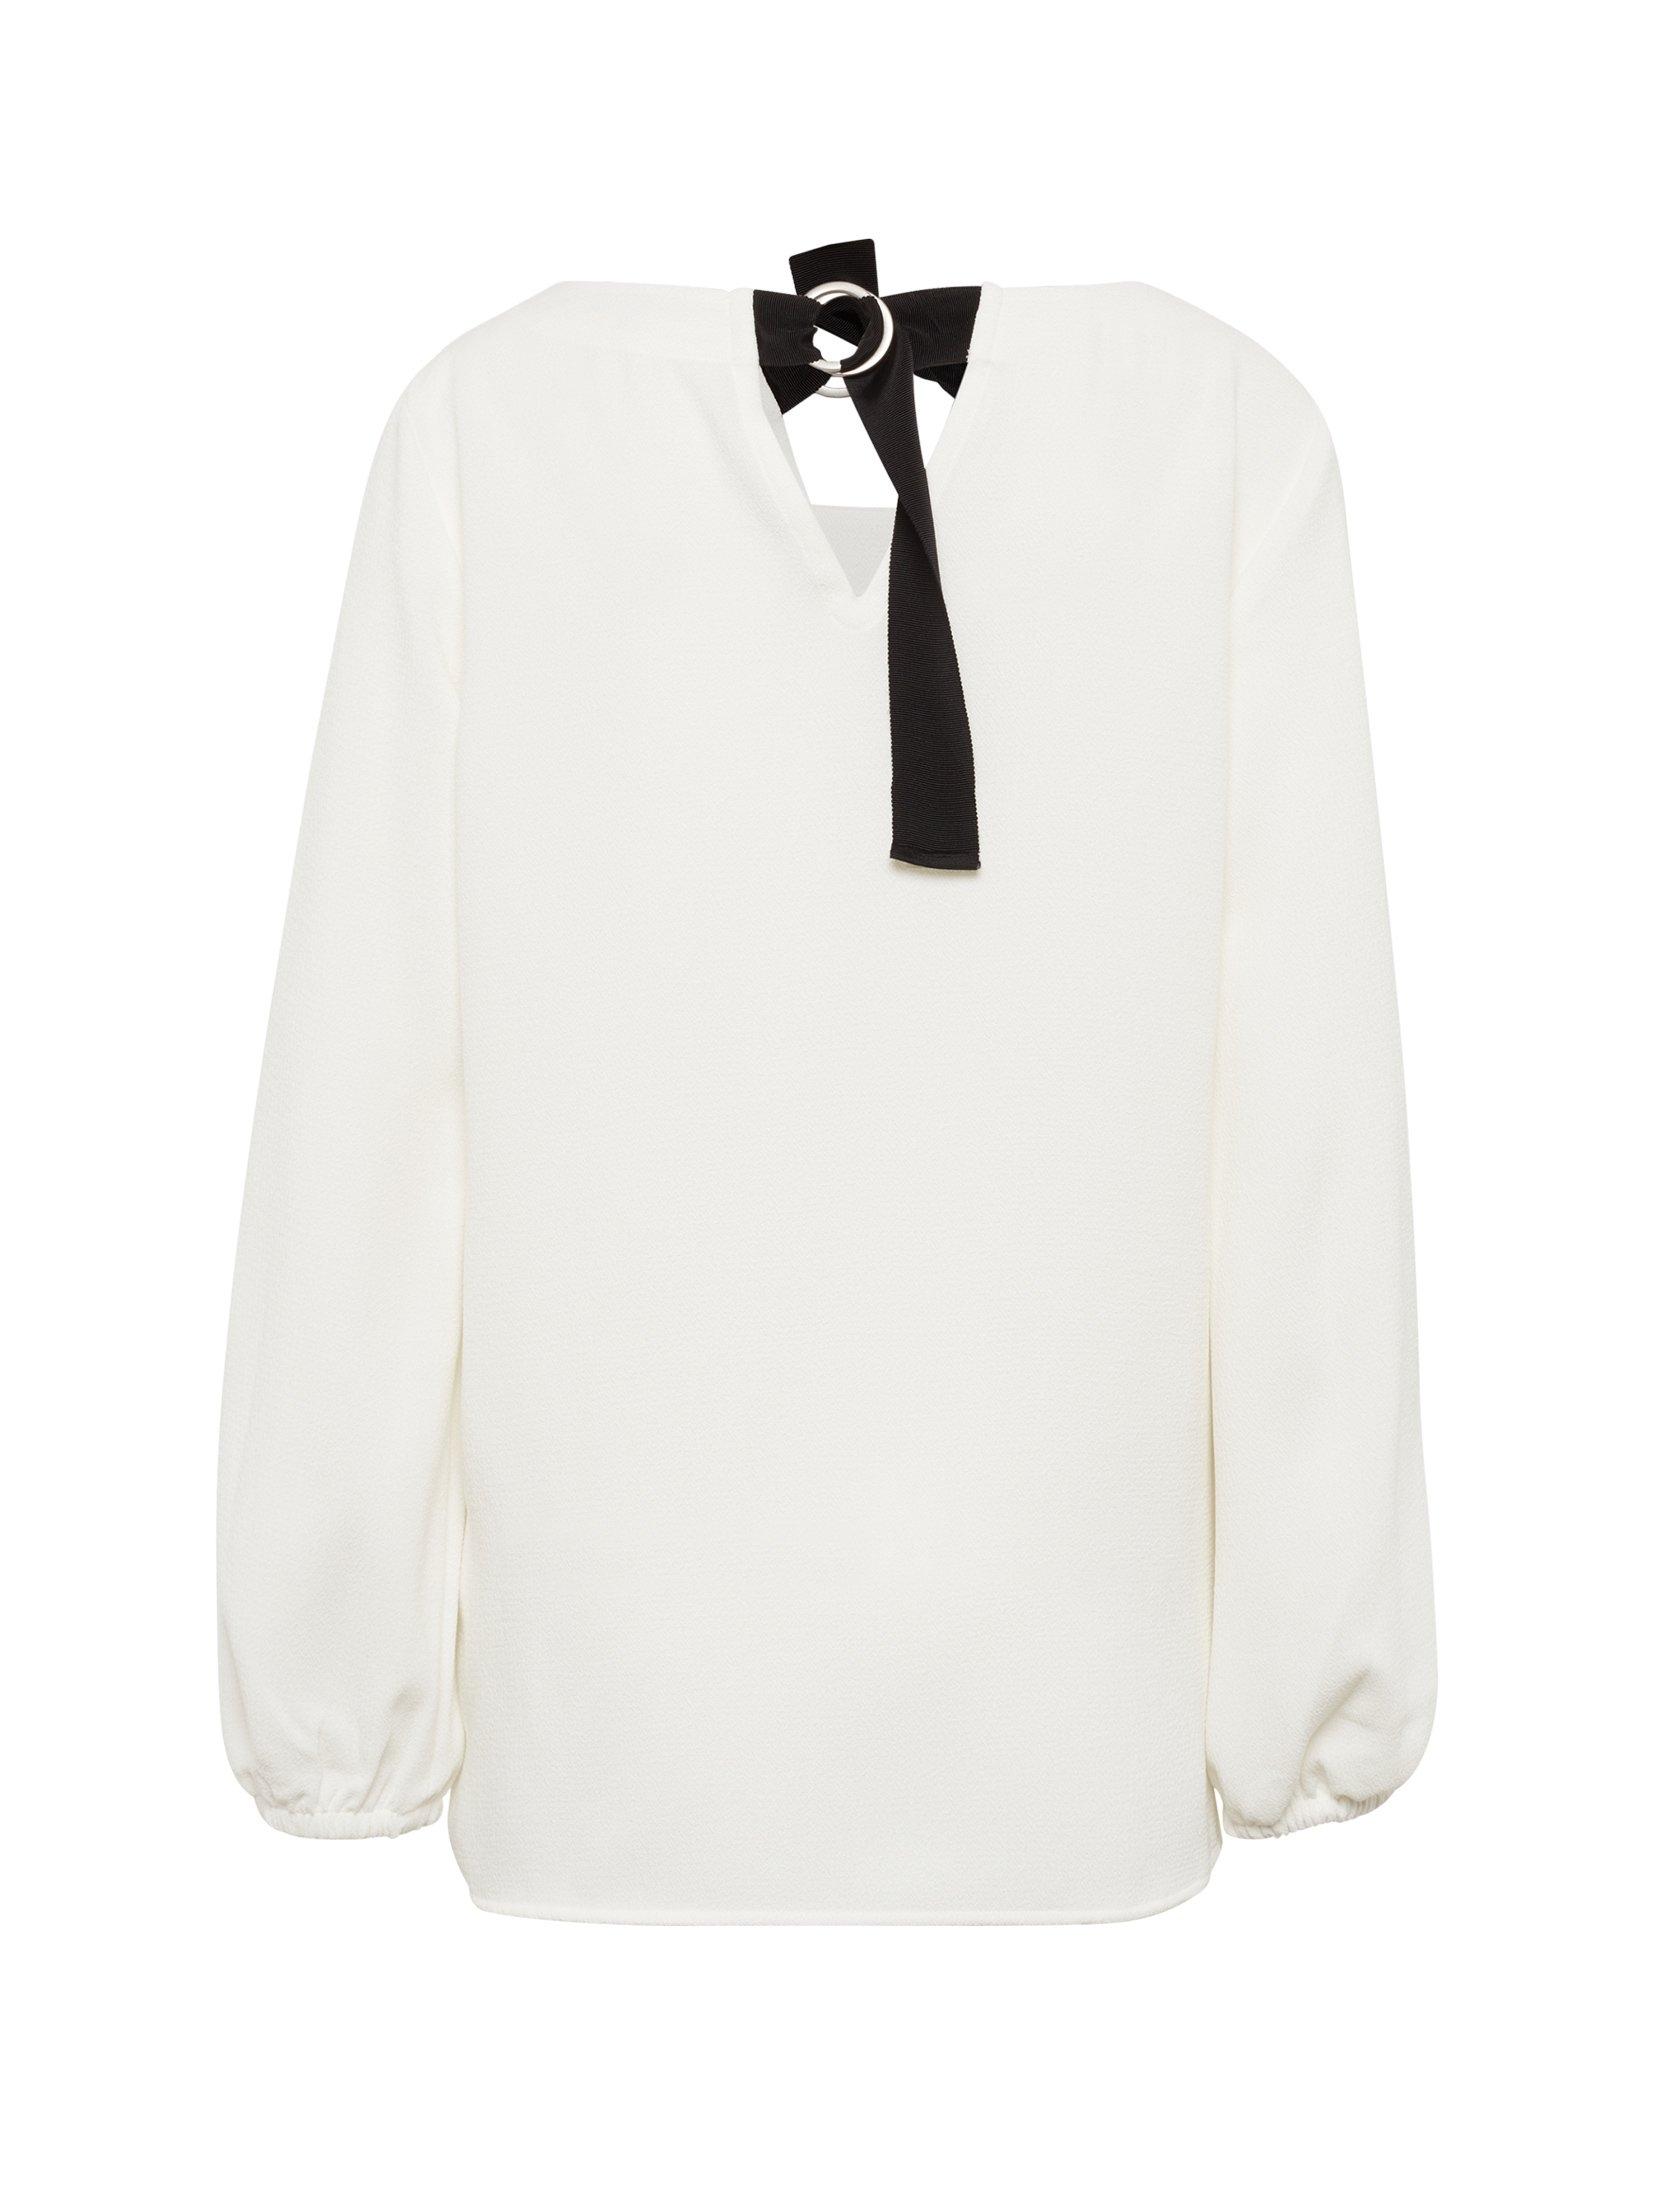 Online Tailor Shirtblousetuniek Bij Tailor Tom Tom Shirtblousetuniek VSzpUqM